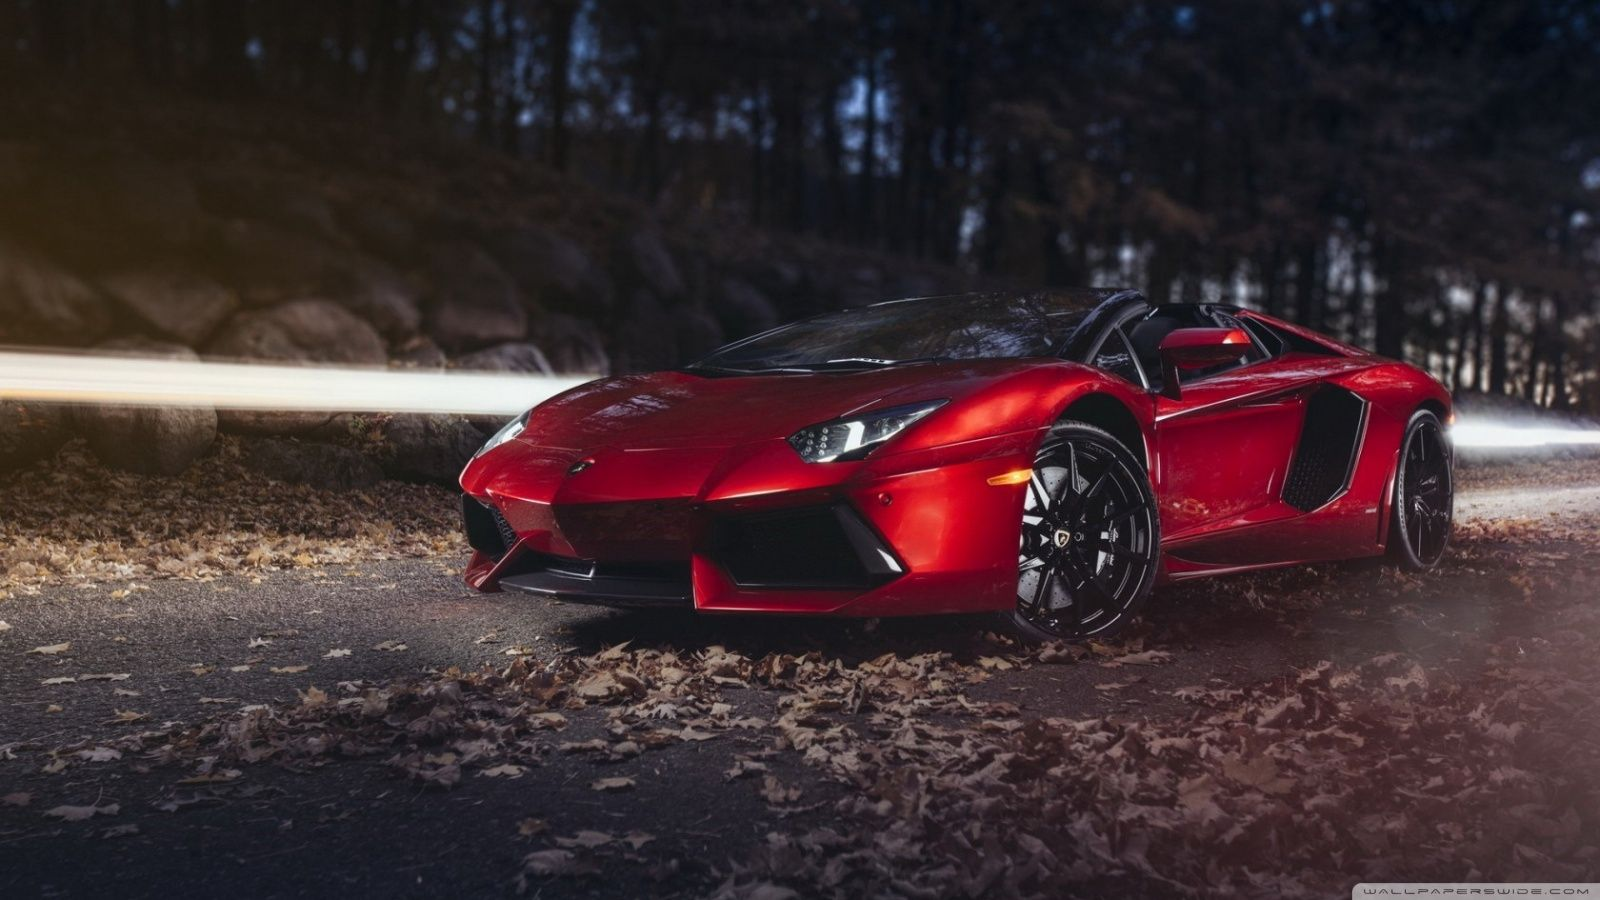 Red Lamborghini Wallpapers Top Free Red Lamborghini Backgrounds Wallpaperaccess